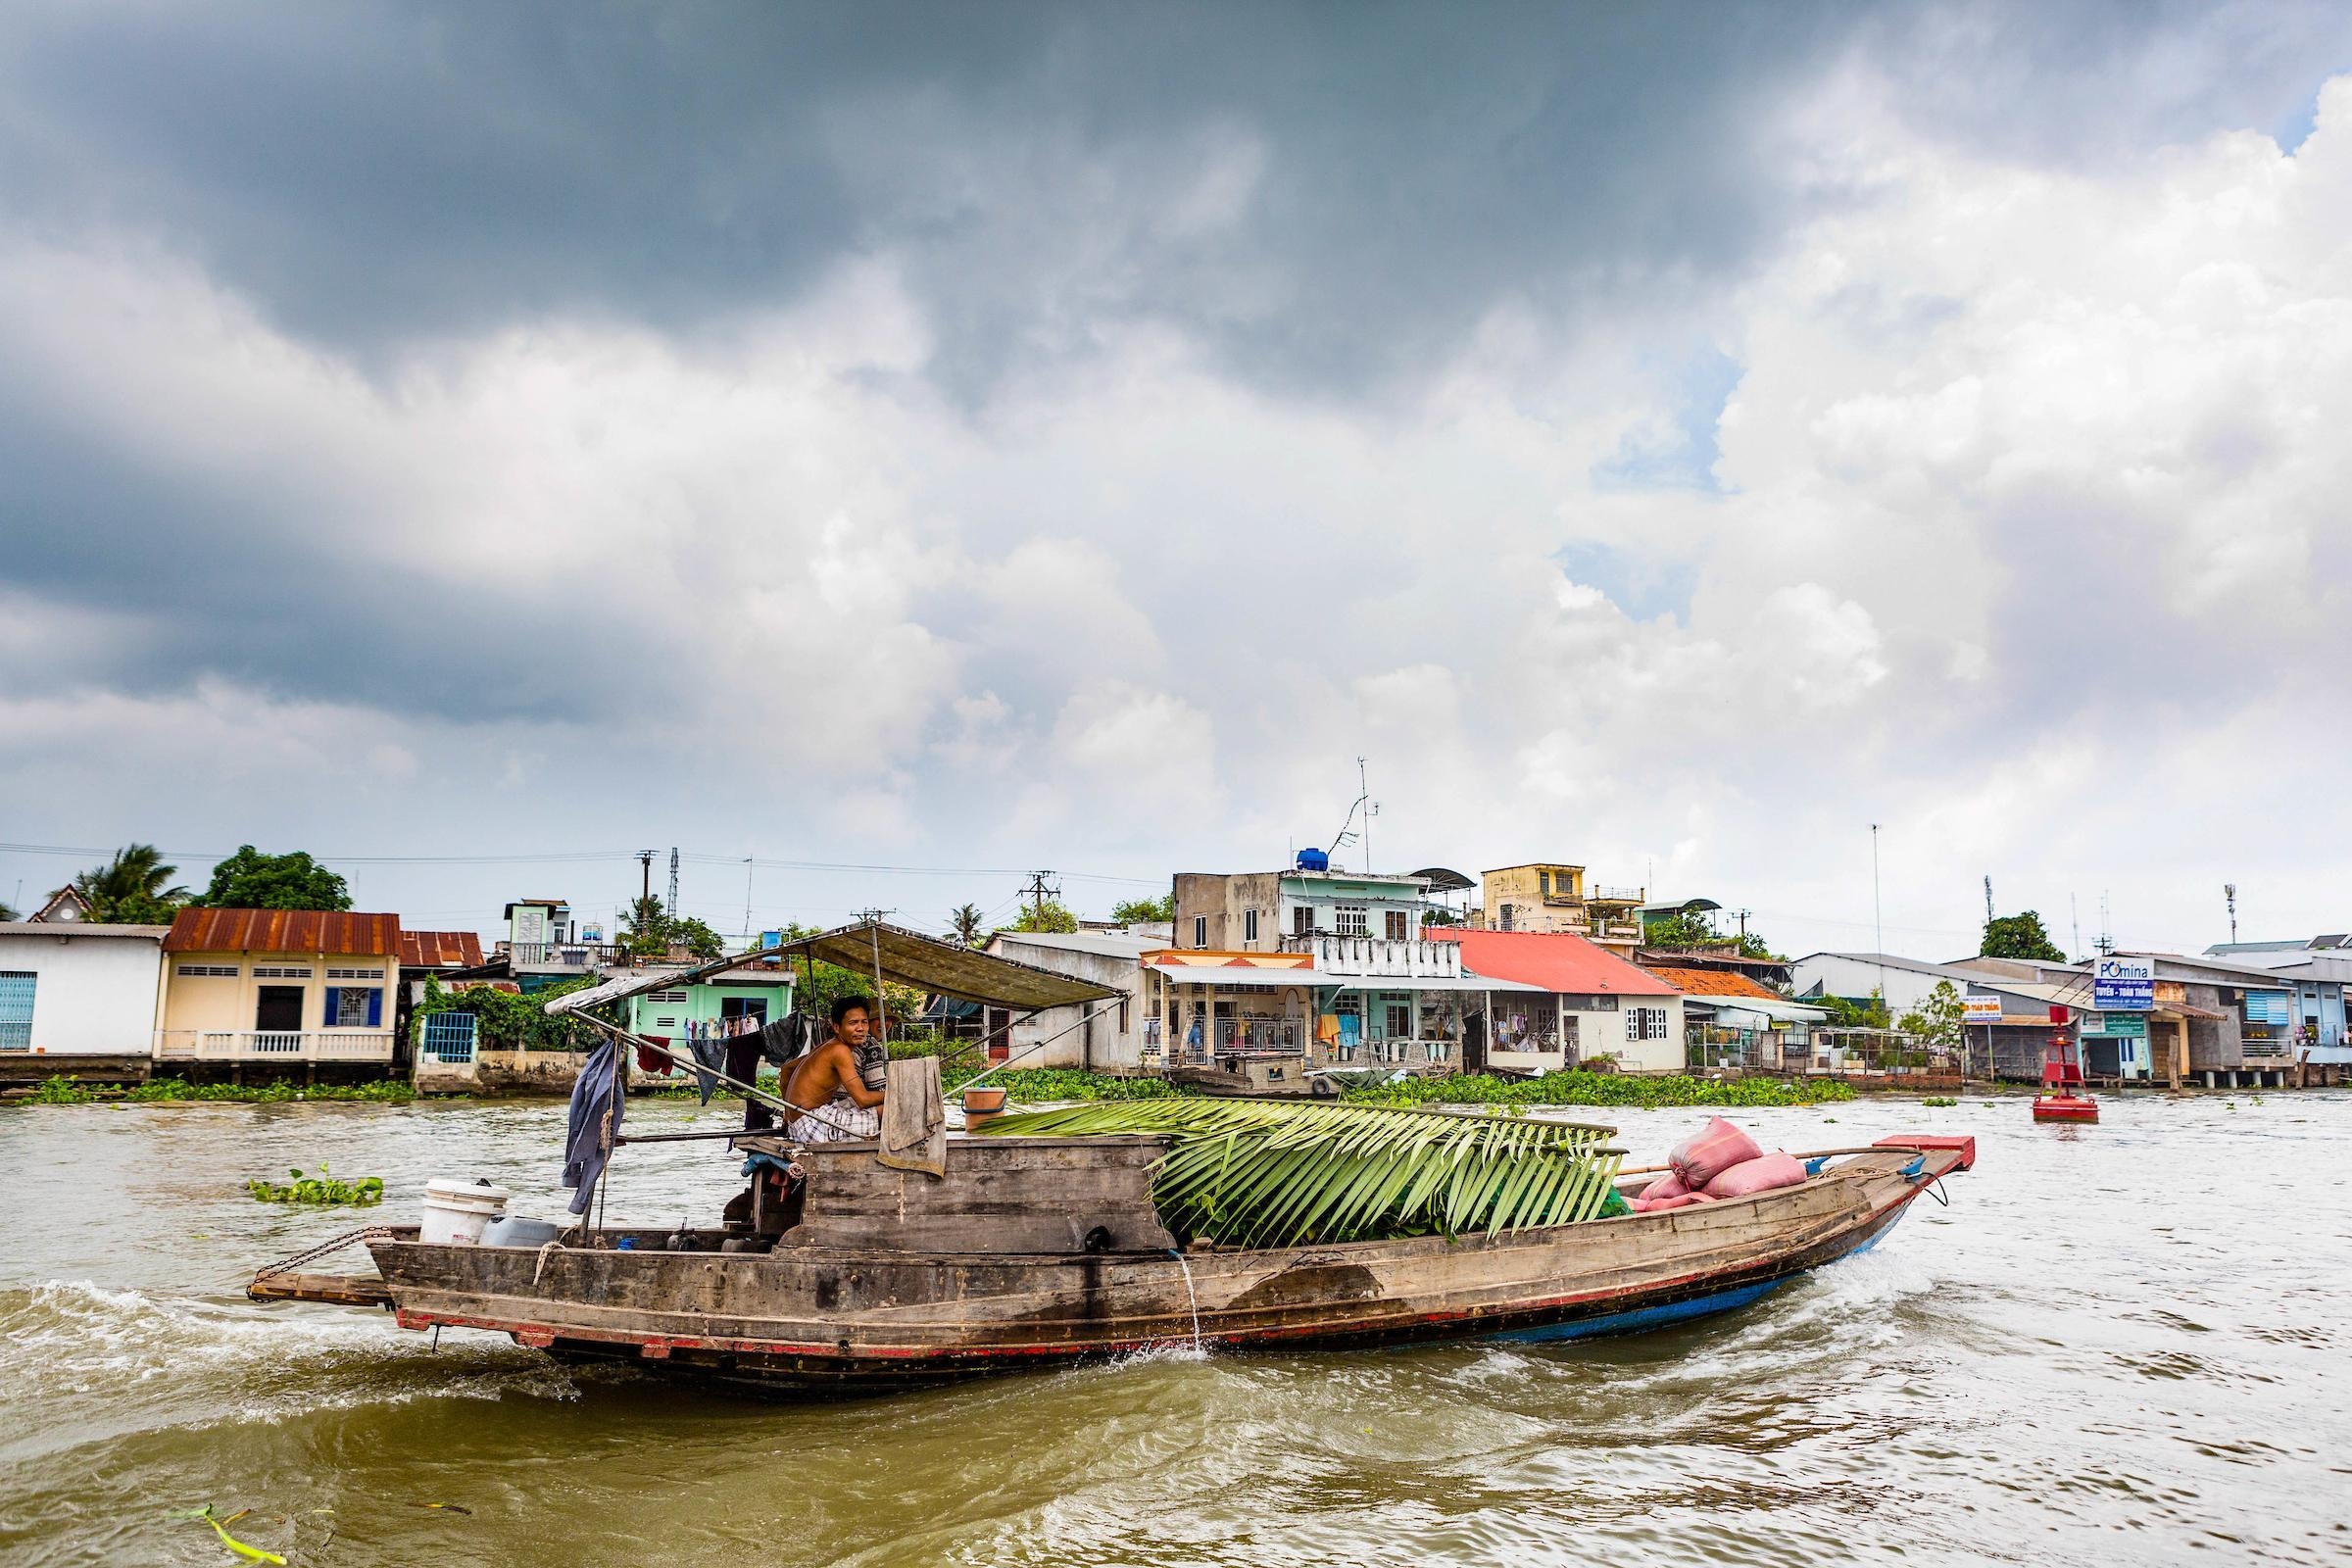 Mekong River Cruises from Ho Chi Minh City